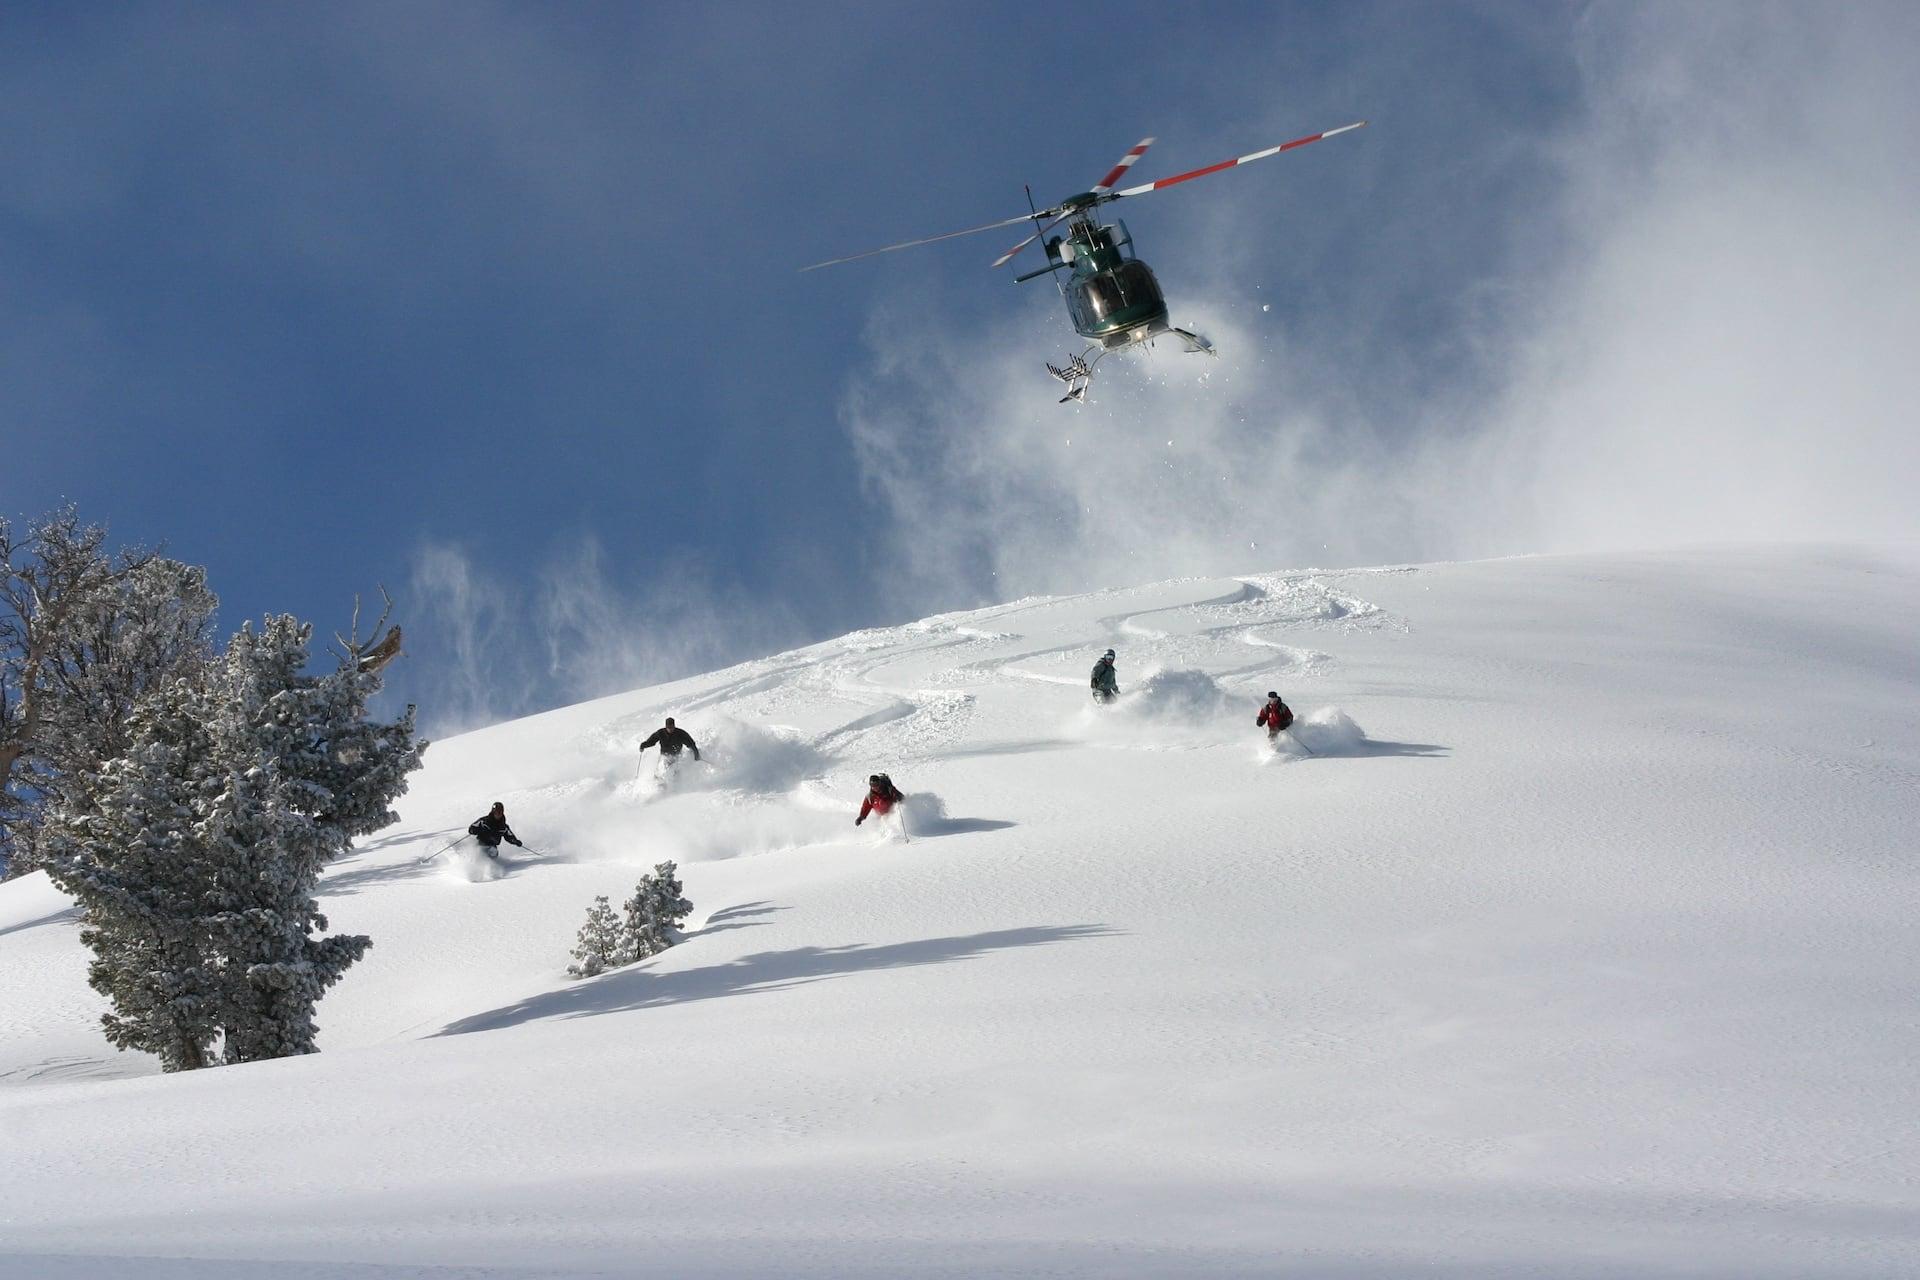 heli with skiers